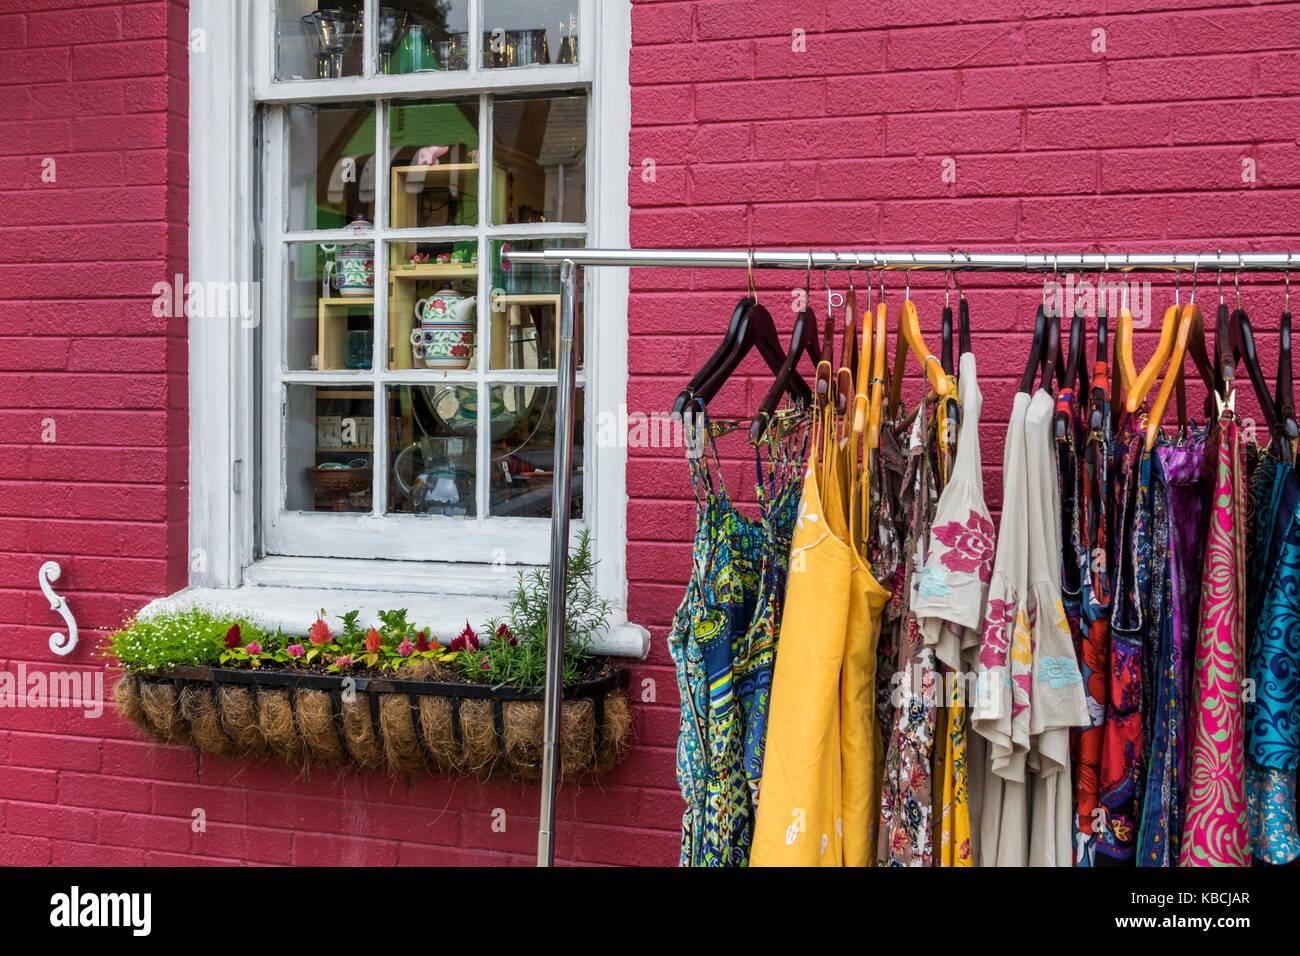 Urban clothing stores in richmond va